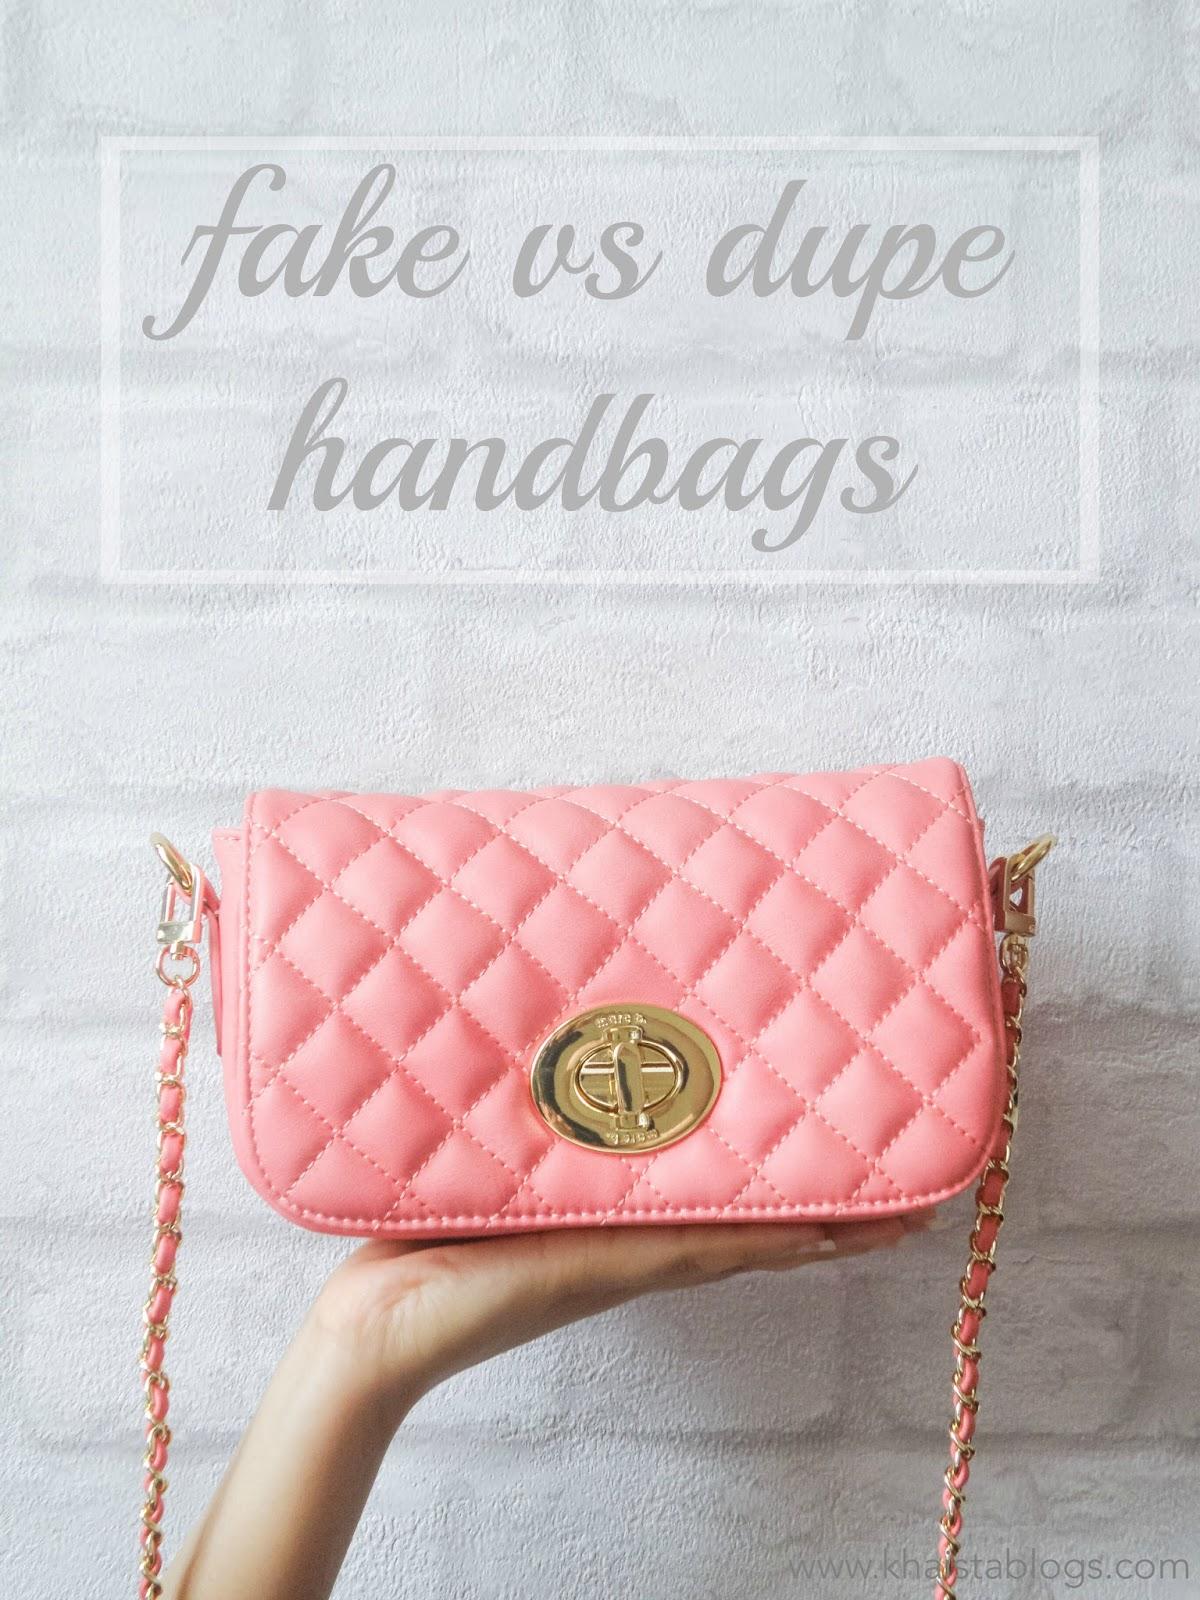 fake vs dupe handbags